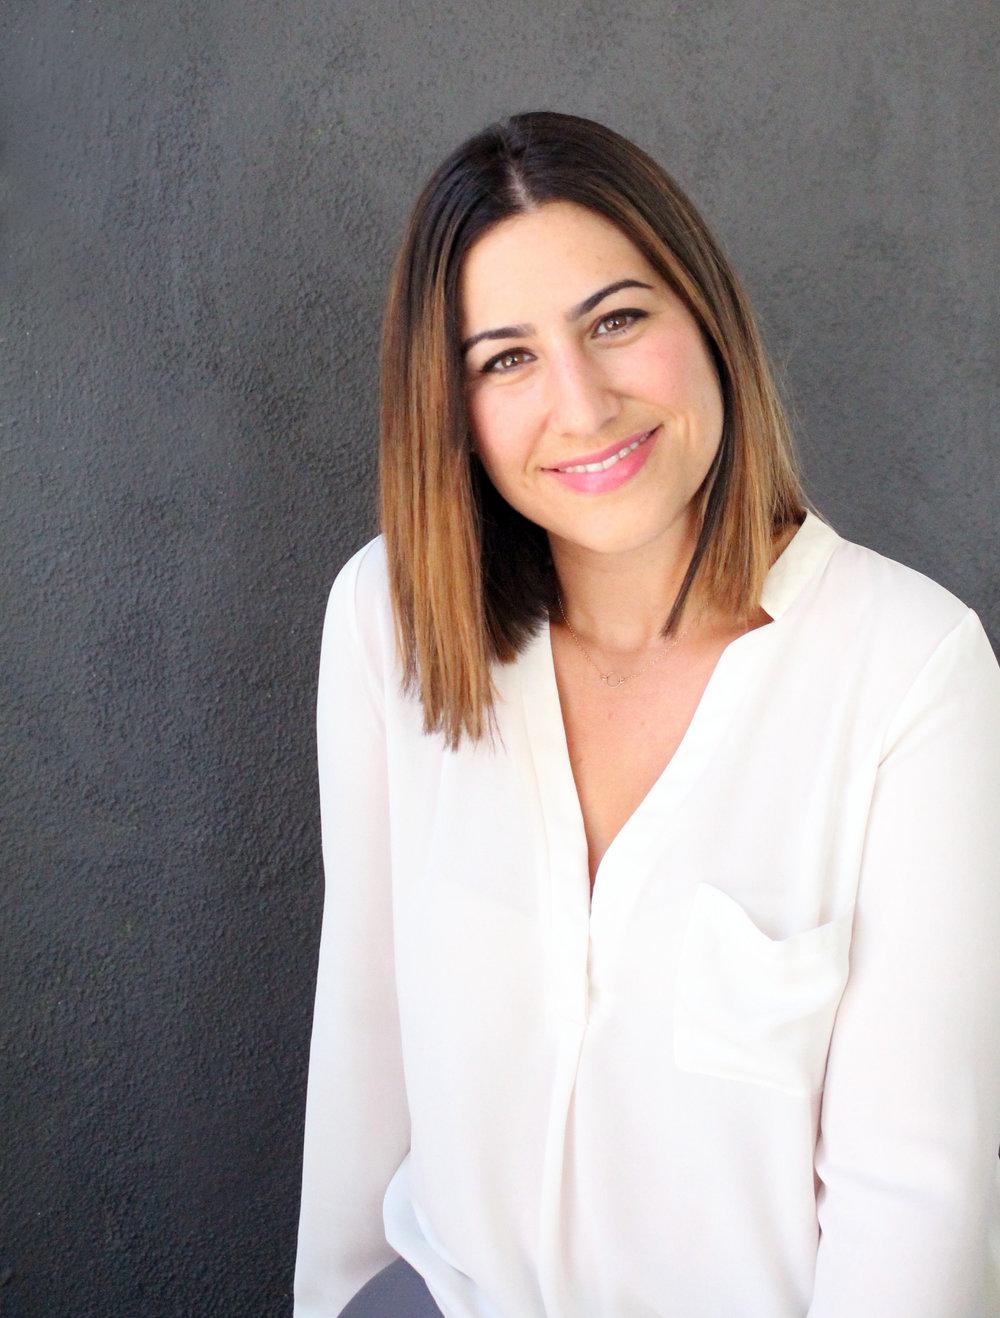 Arica Rosenthal